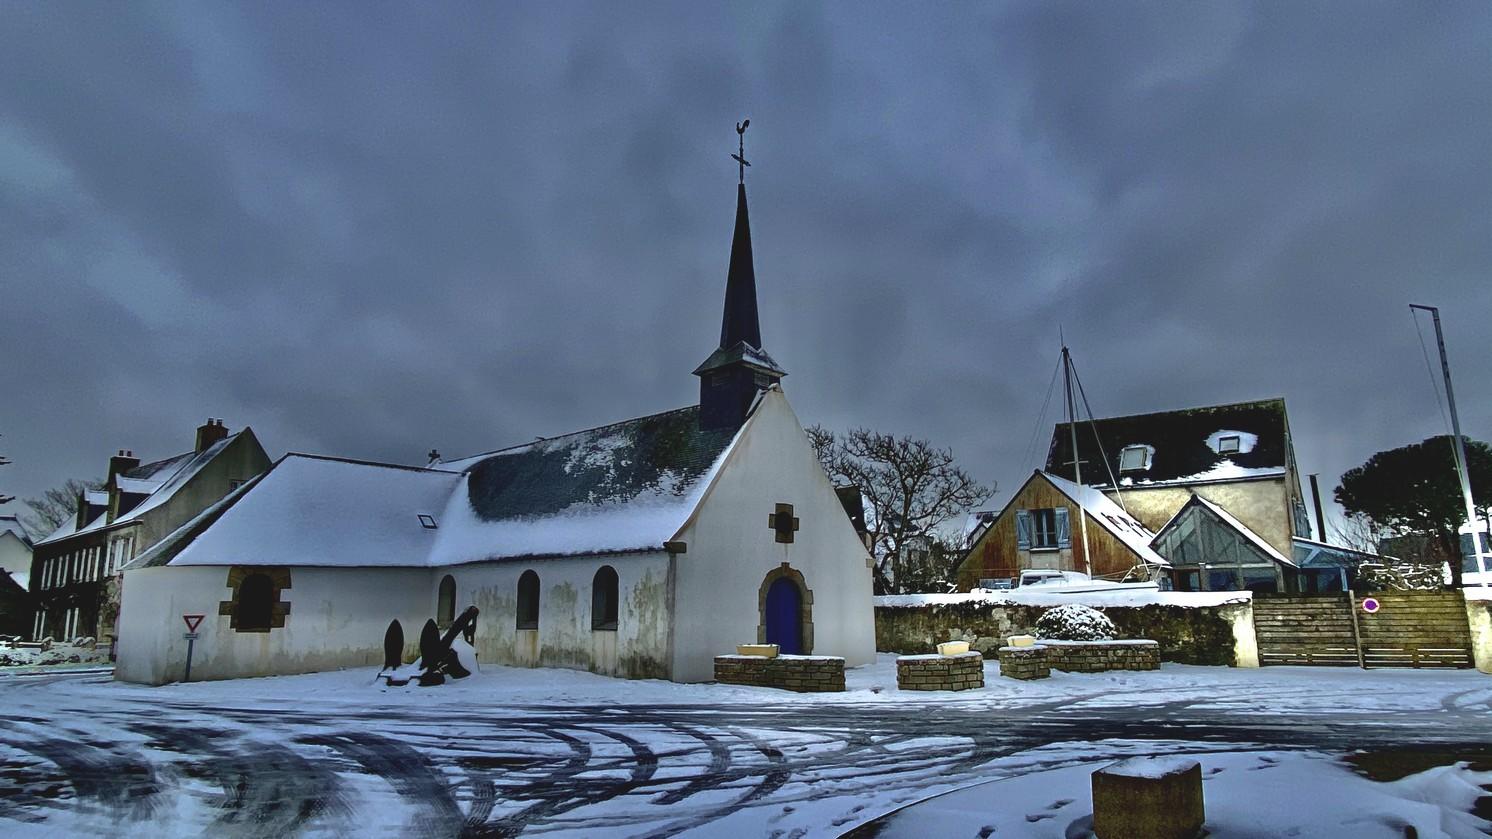 Penerf en Damgan sous la neige - morbihan bretagne©Philippe Jaquemin (16)